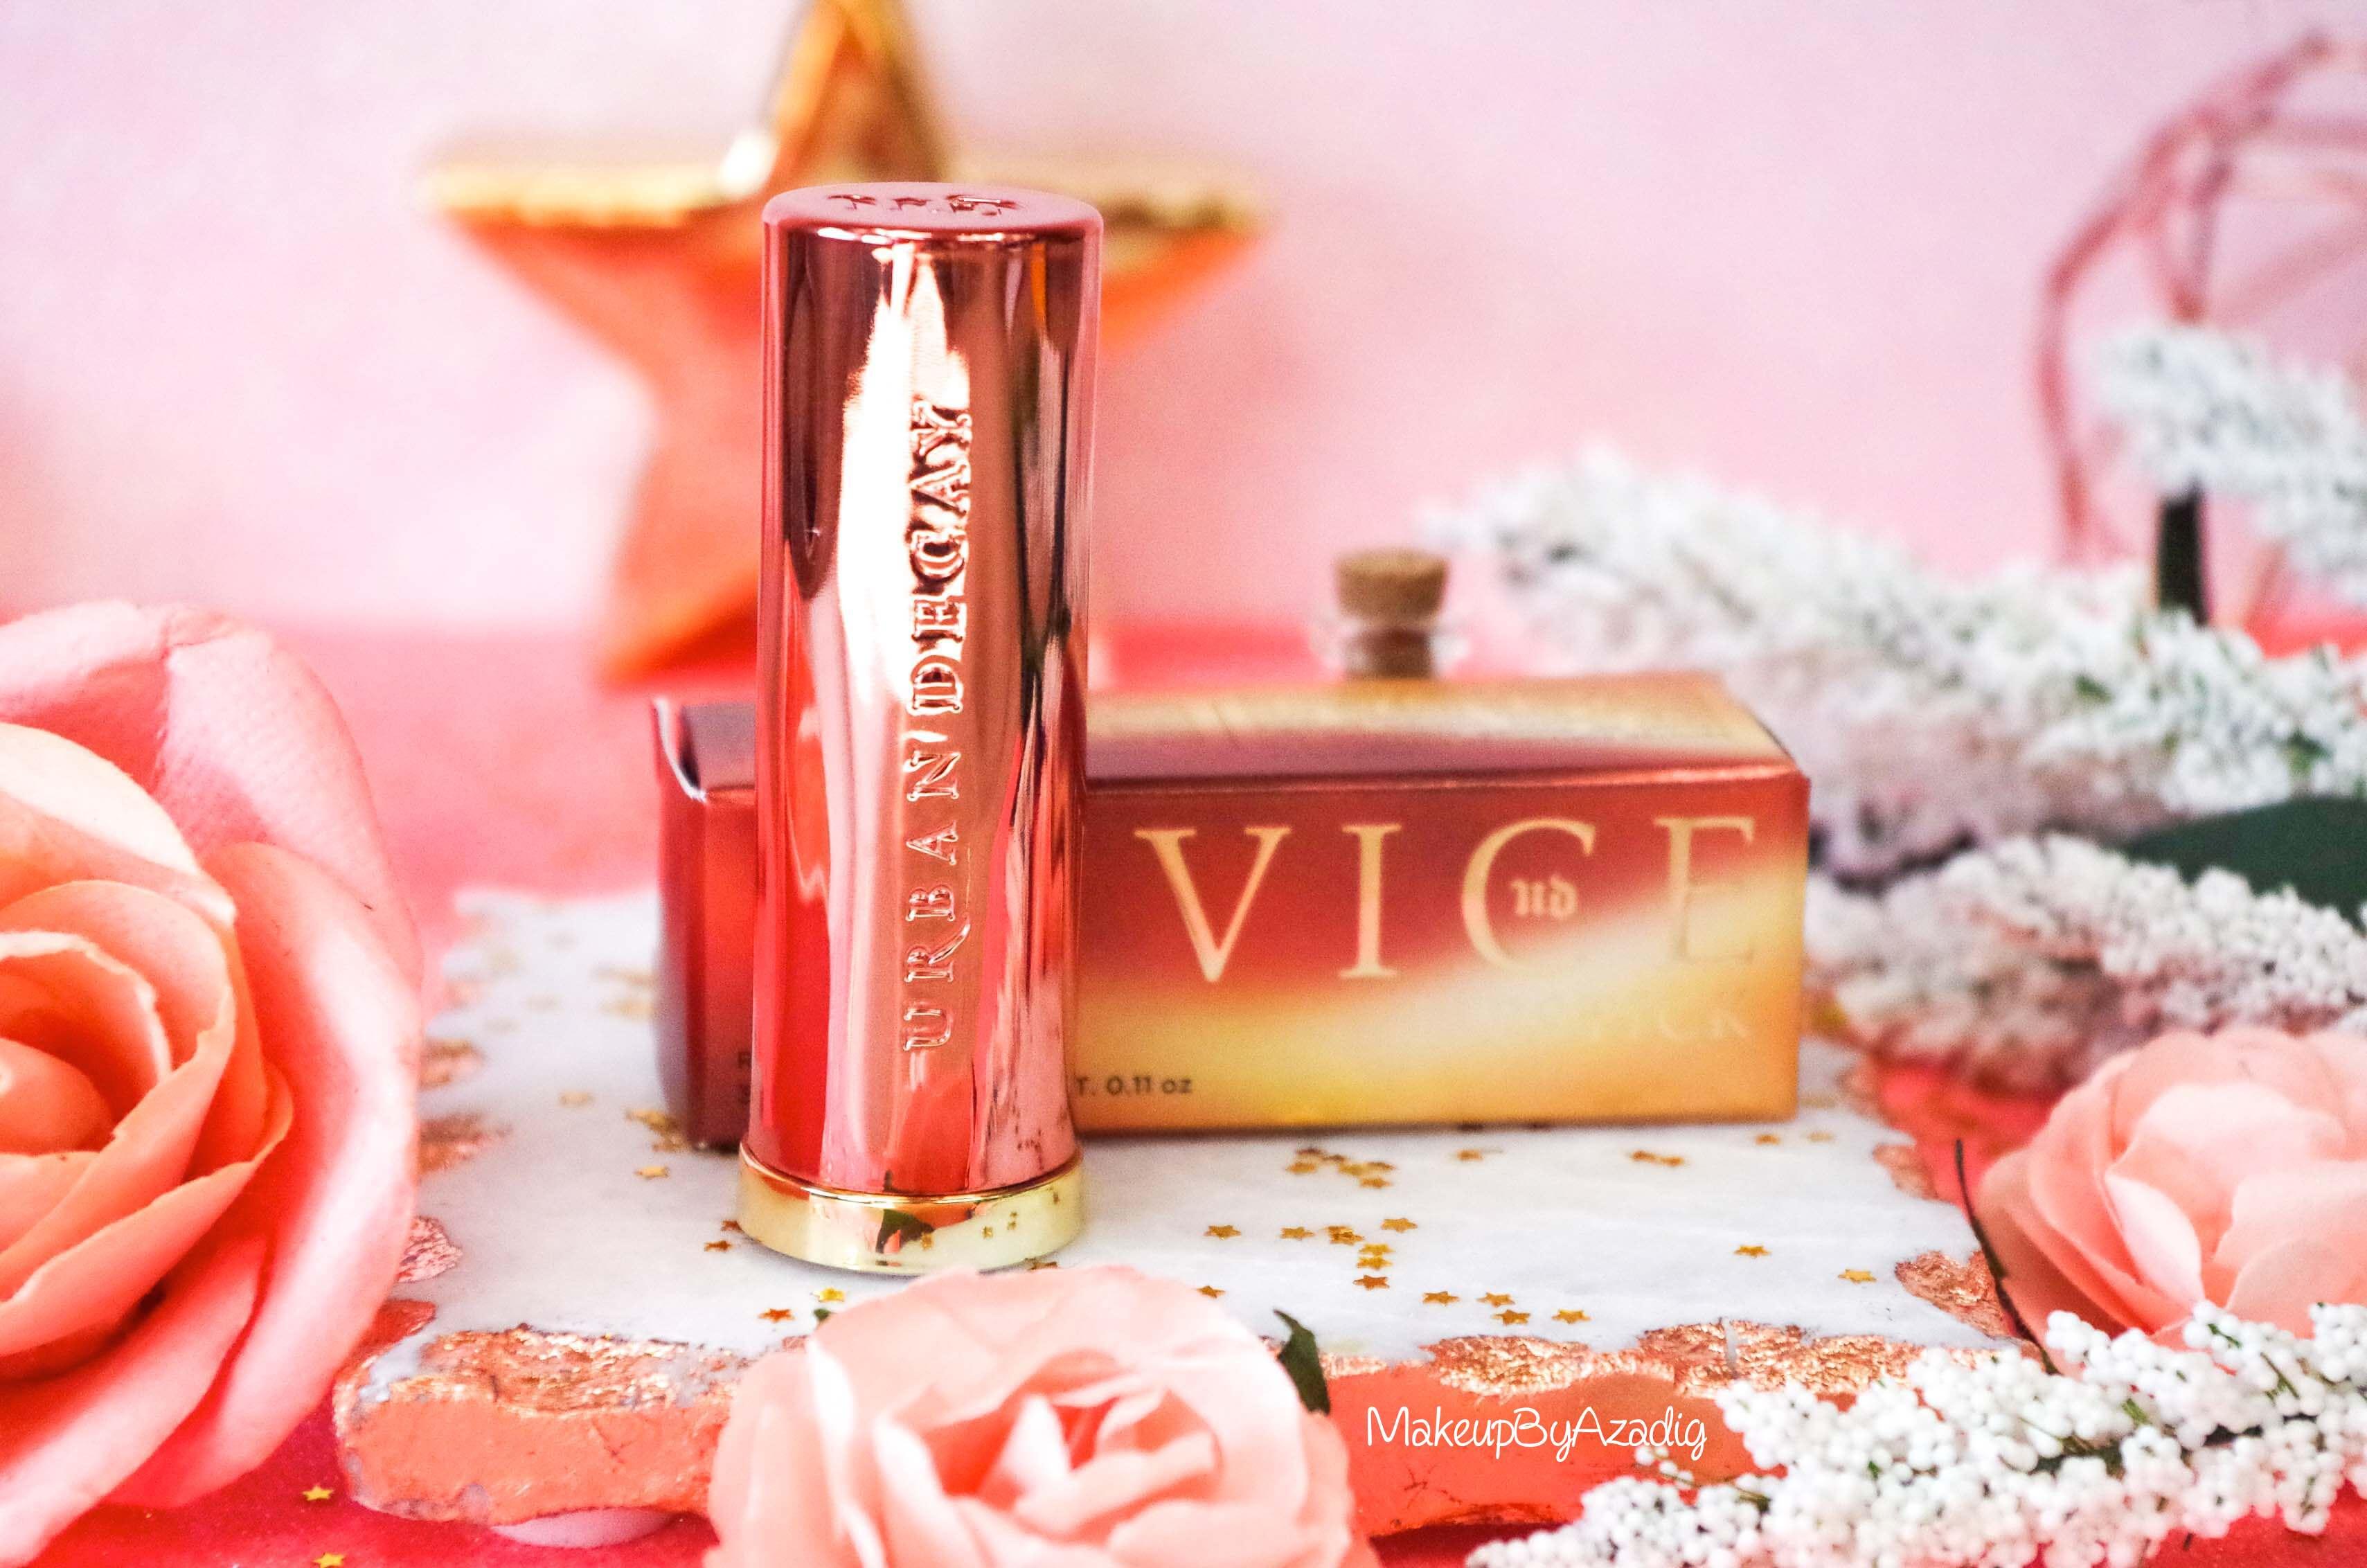 orange-revue-review-naked-heat-vice-lipstick-fuel-heat-scorched-sephora-urban-decay-makeupbyazadig-prix-avis-troyes